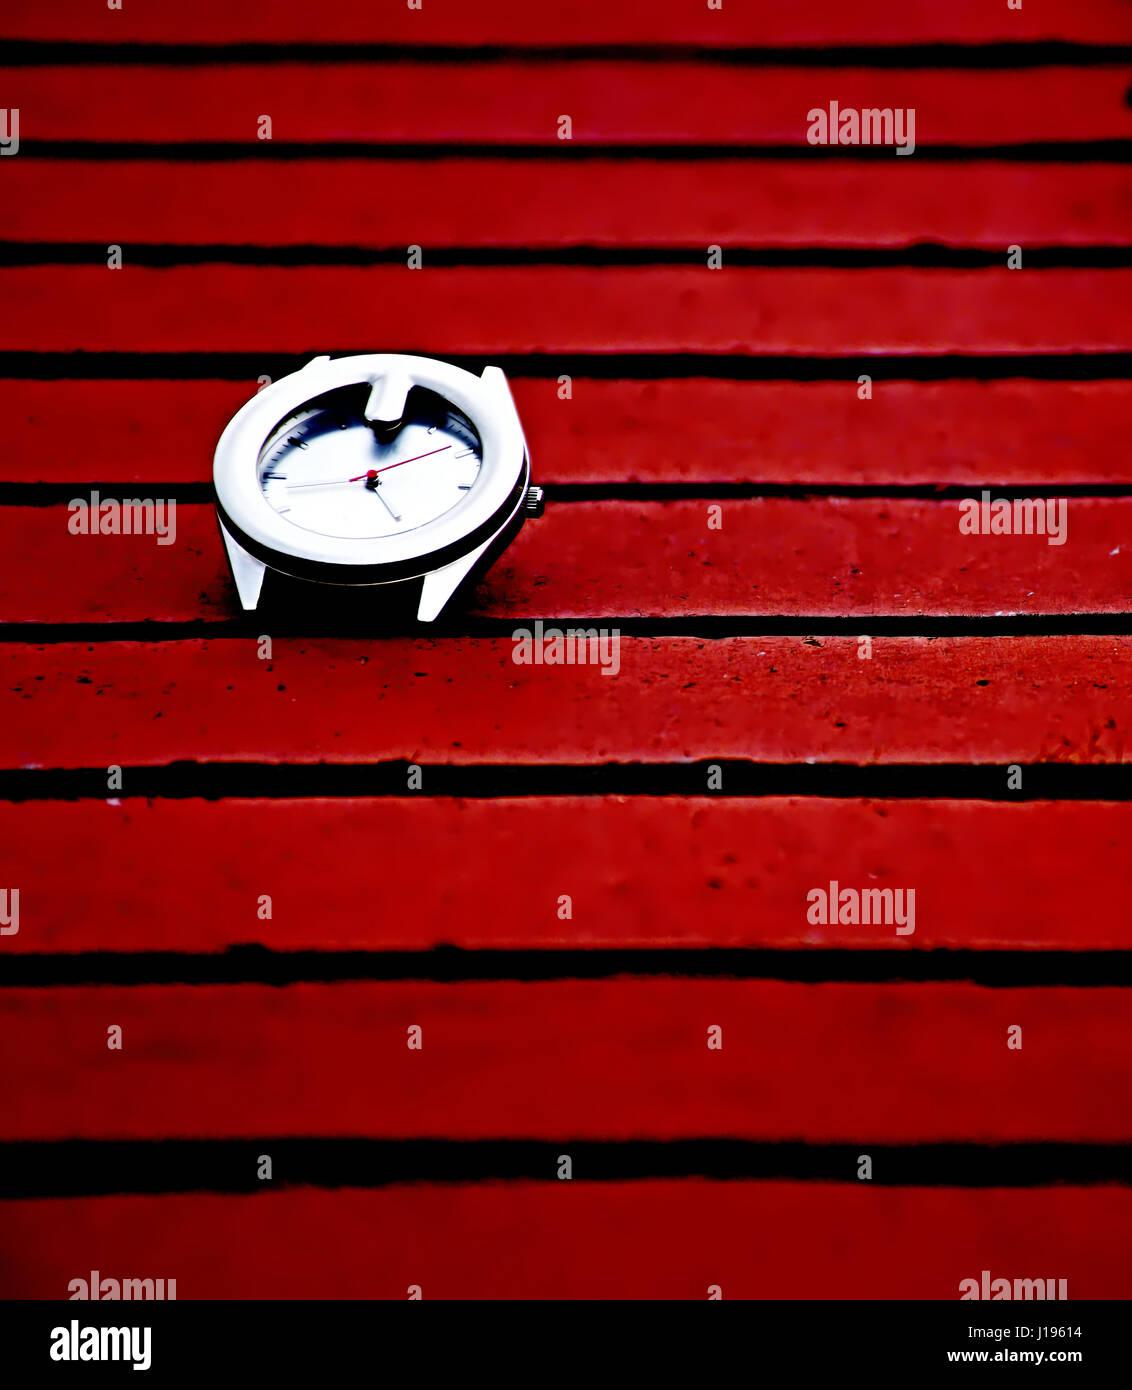 Watch on red bricks. - Stock Image